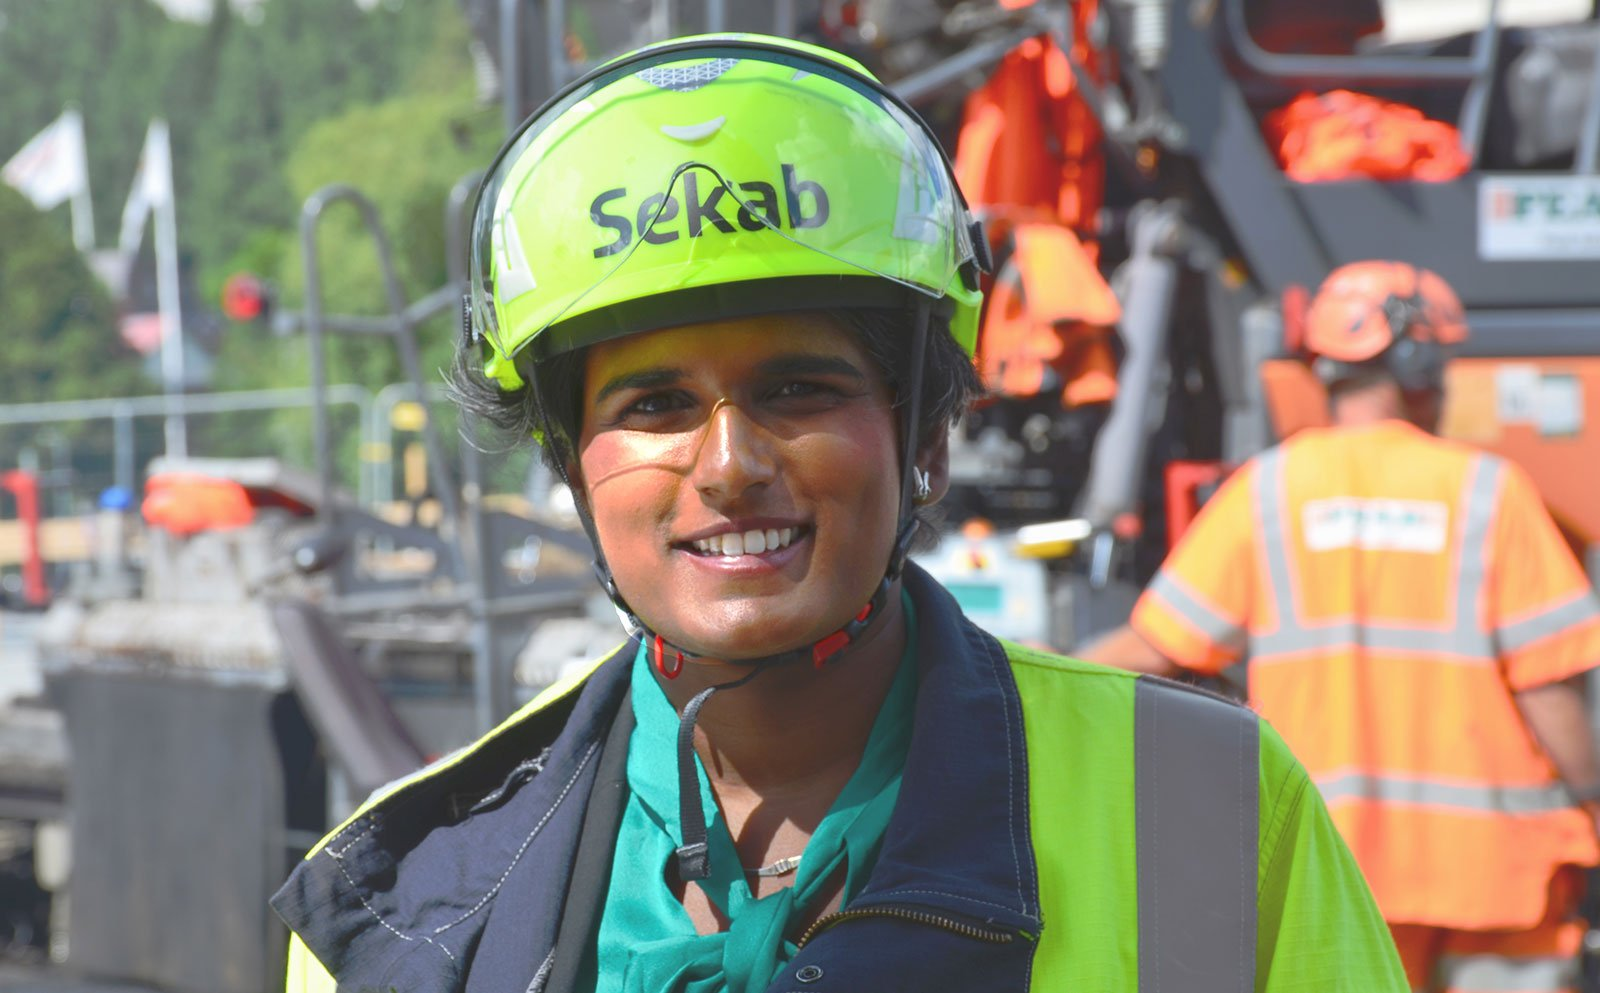 Monica Normark Sekab vid Peab asfaltläggning